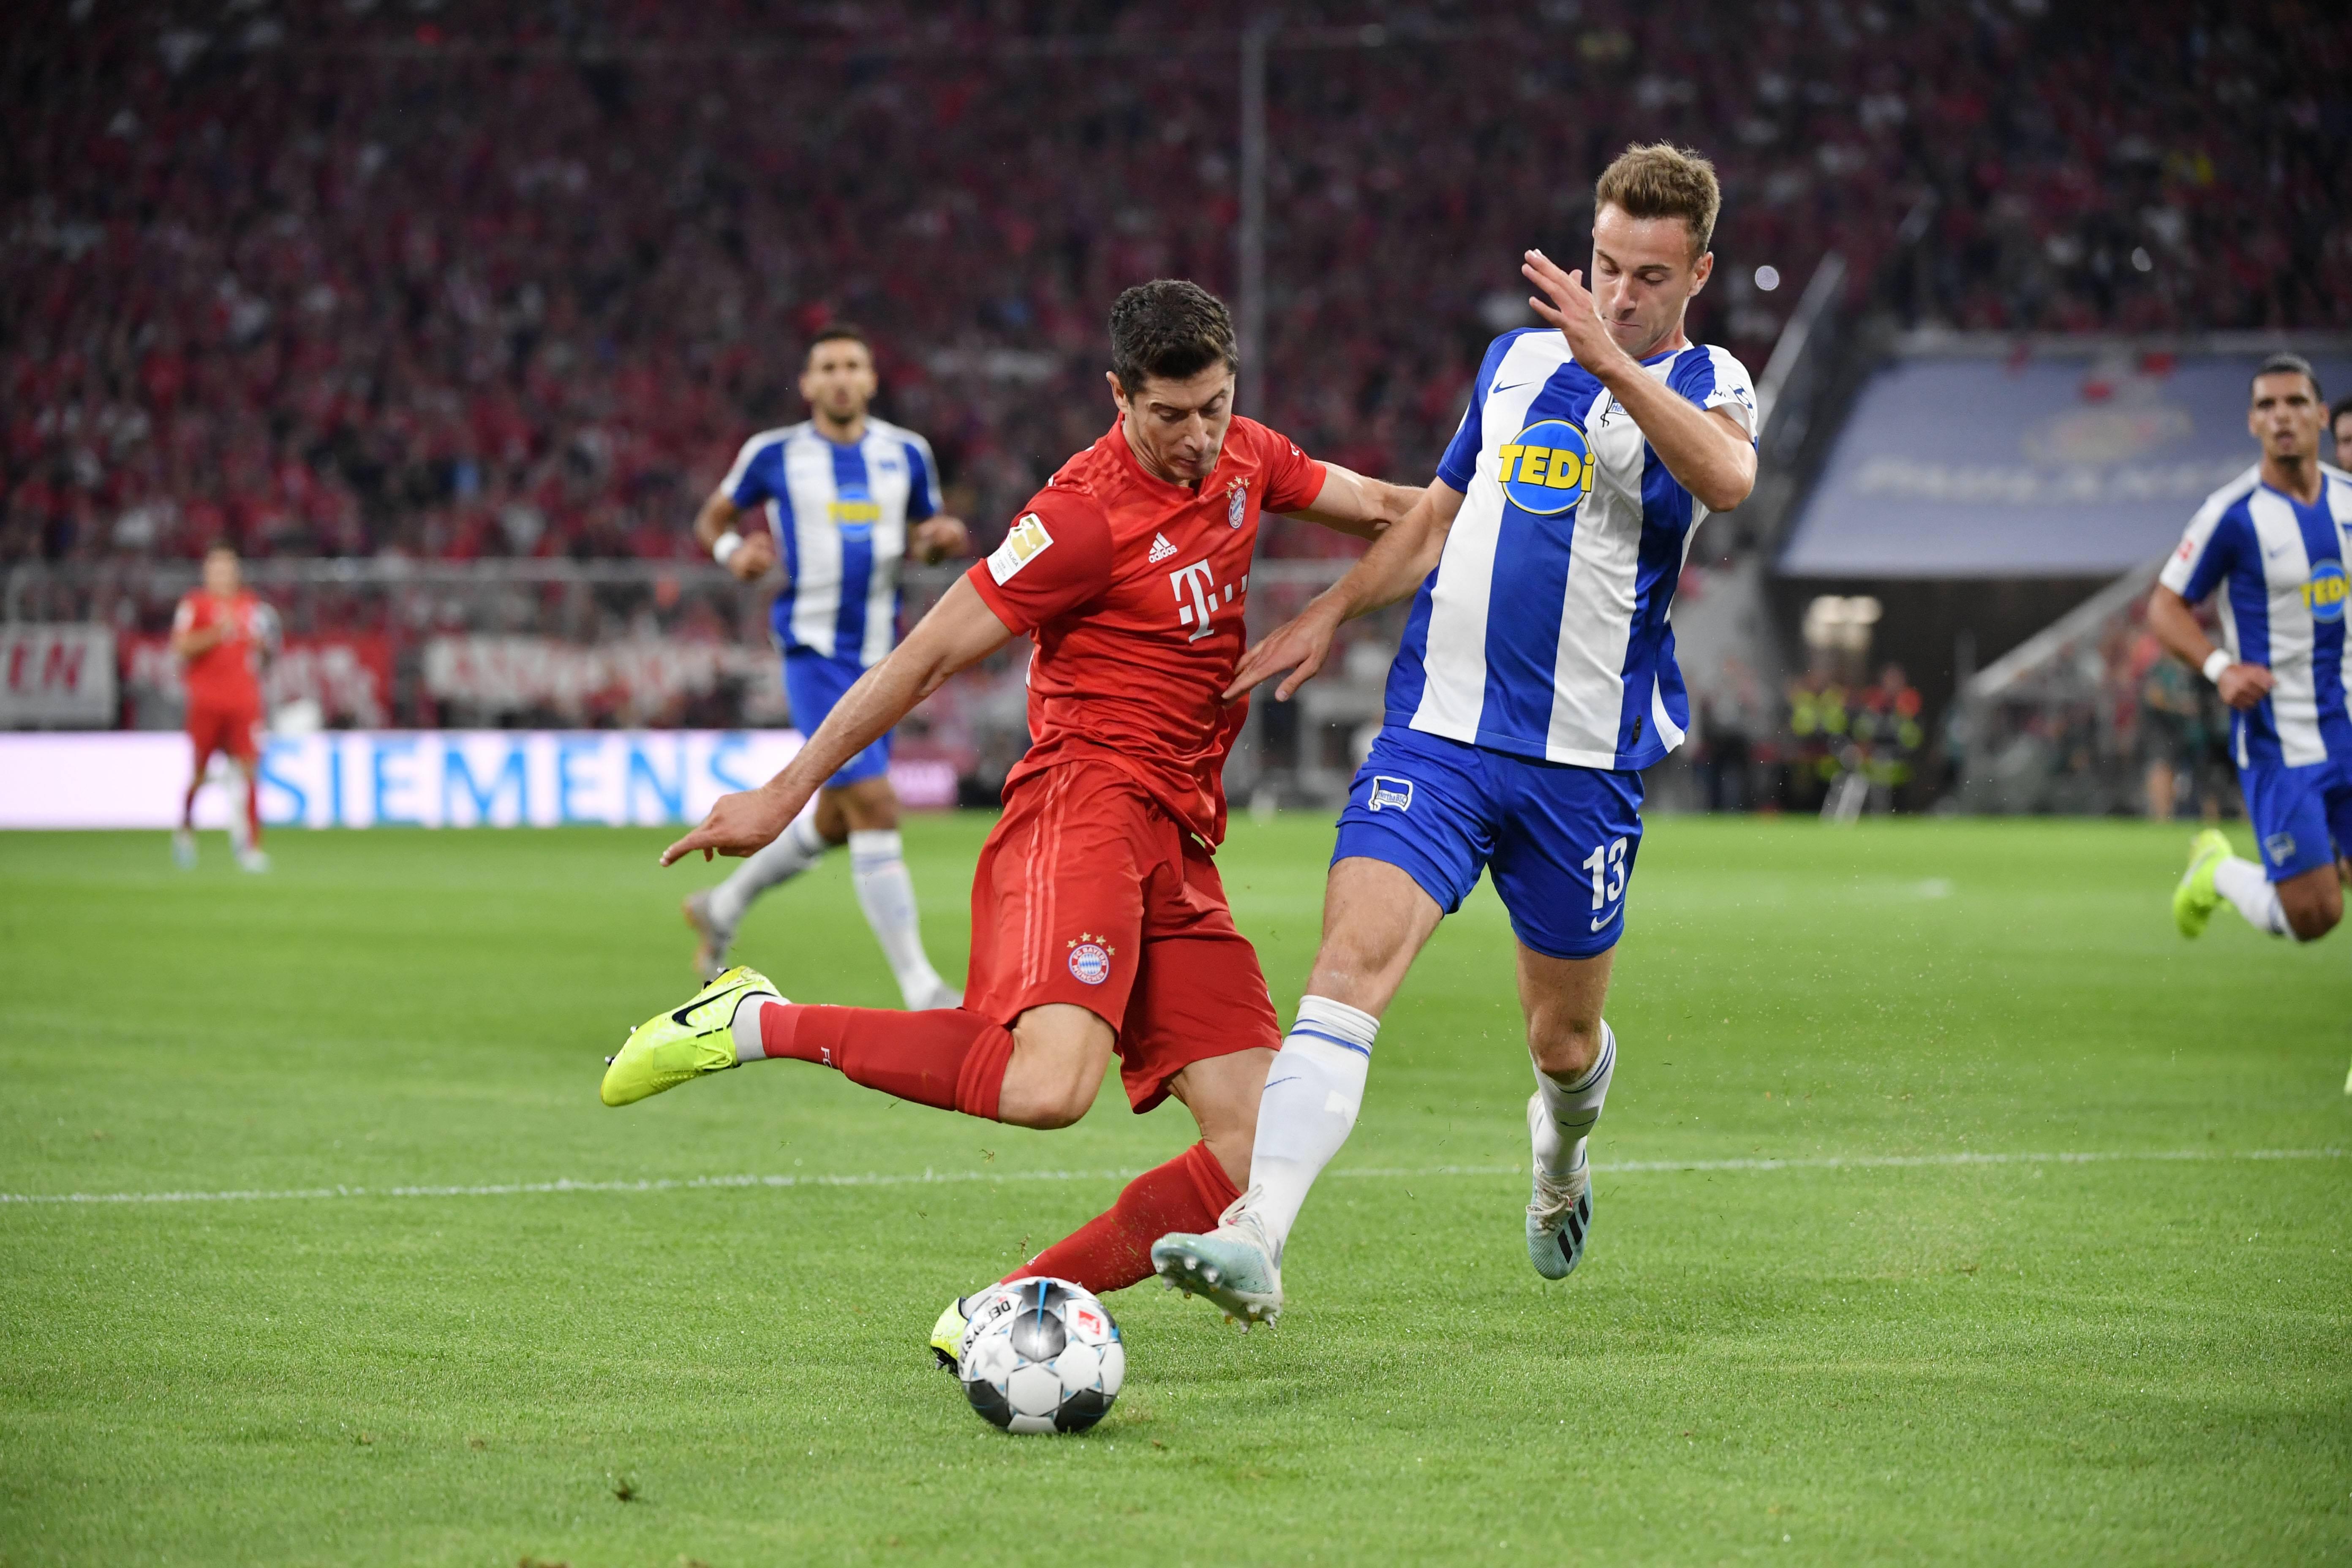 Football - Etranger - Bundesliga : Schalke 04-Bayern Munich en direct